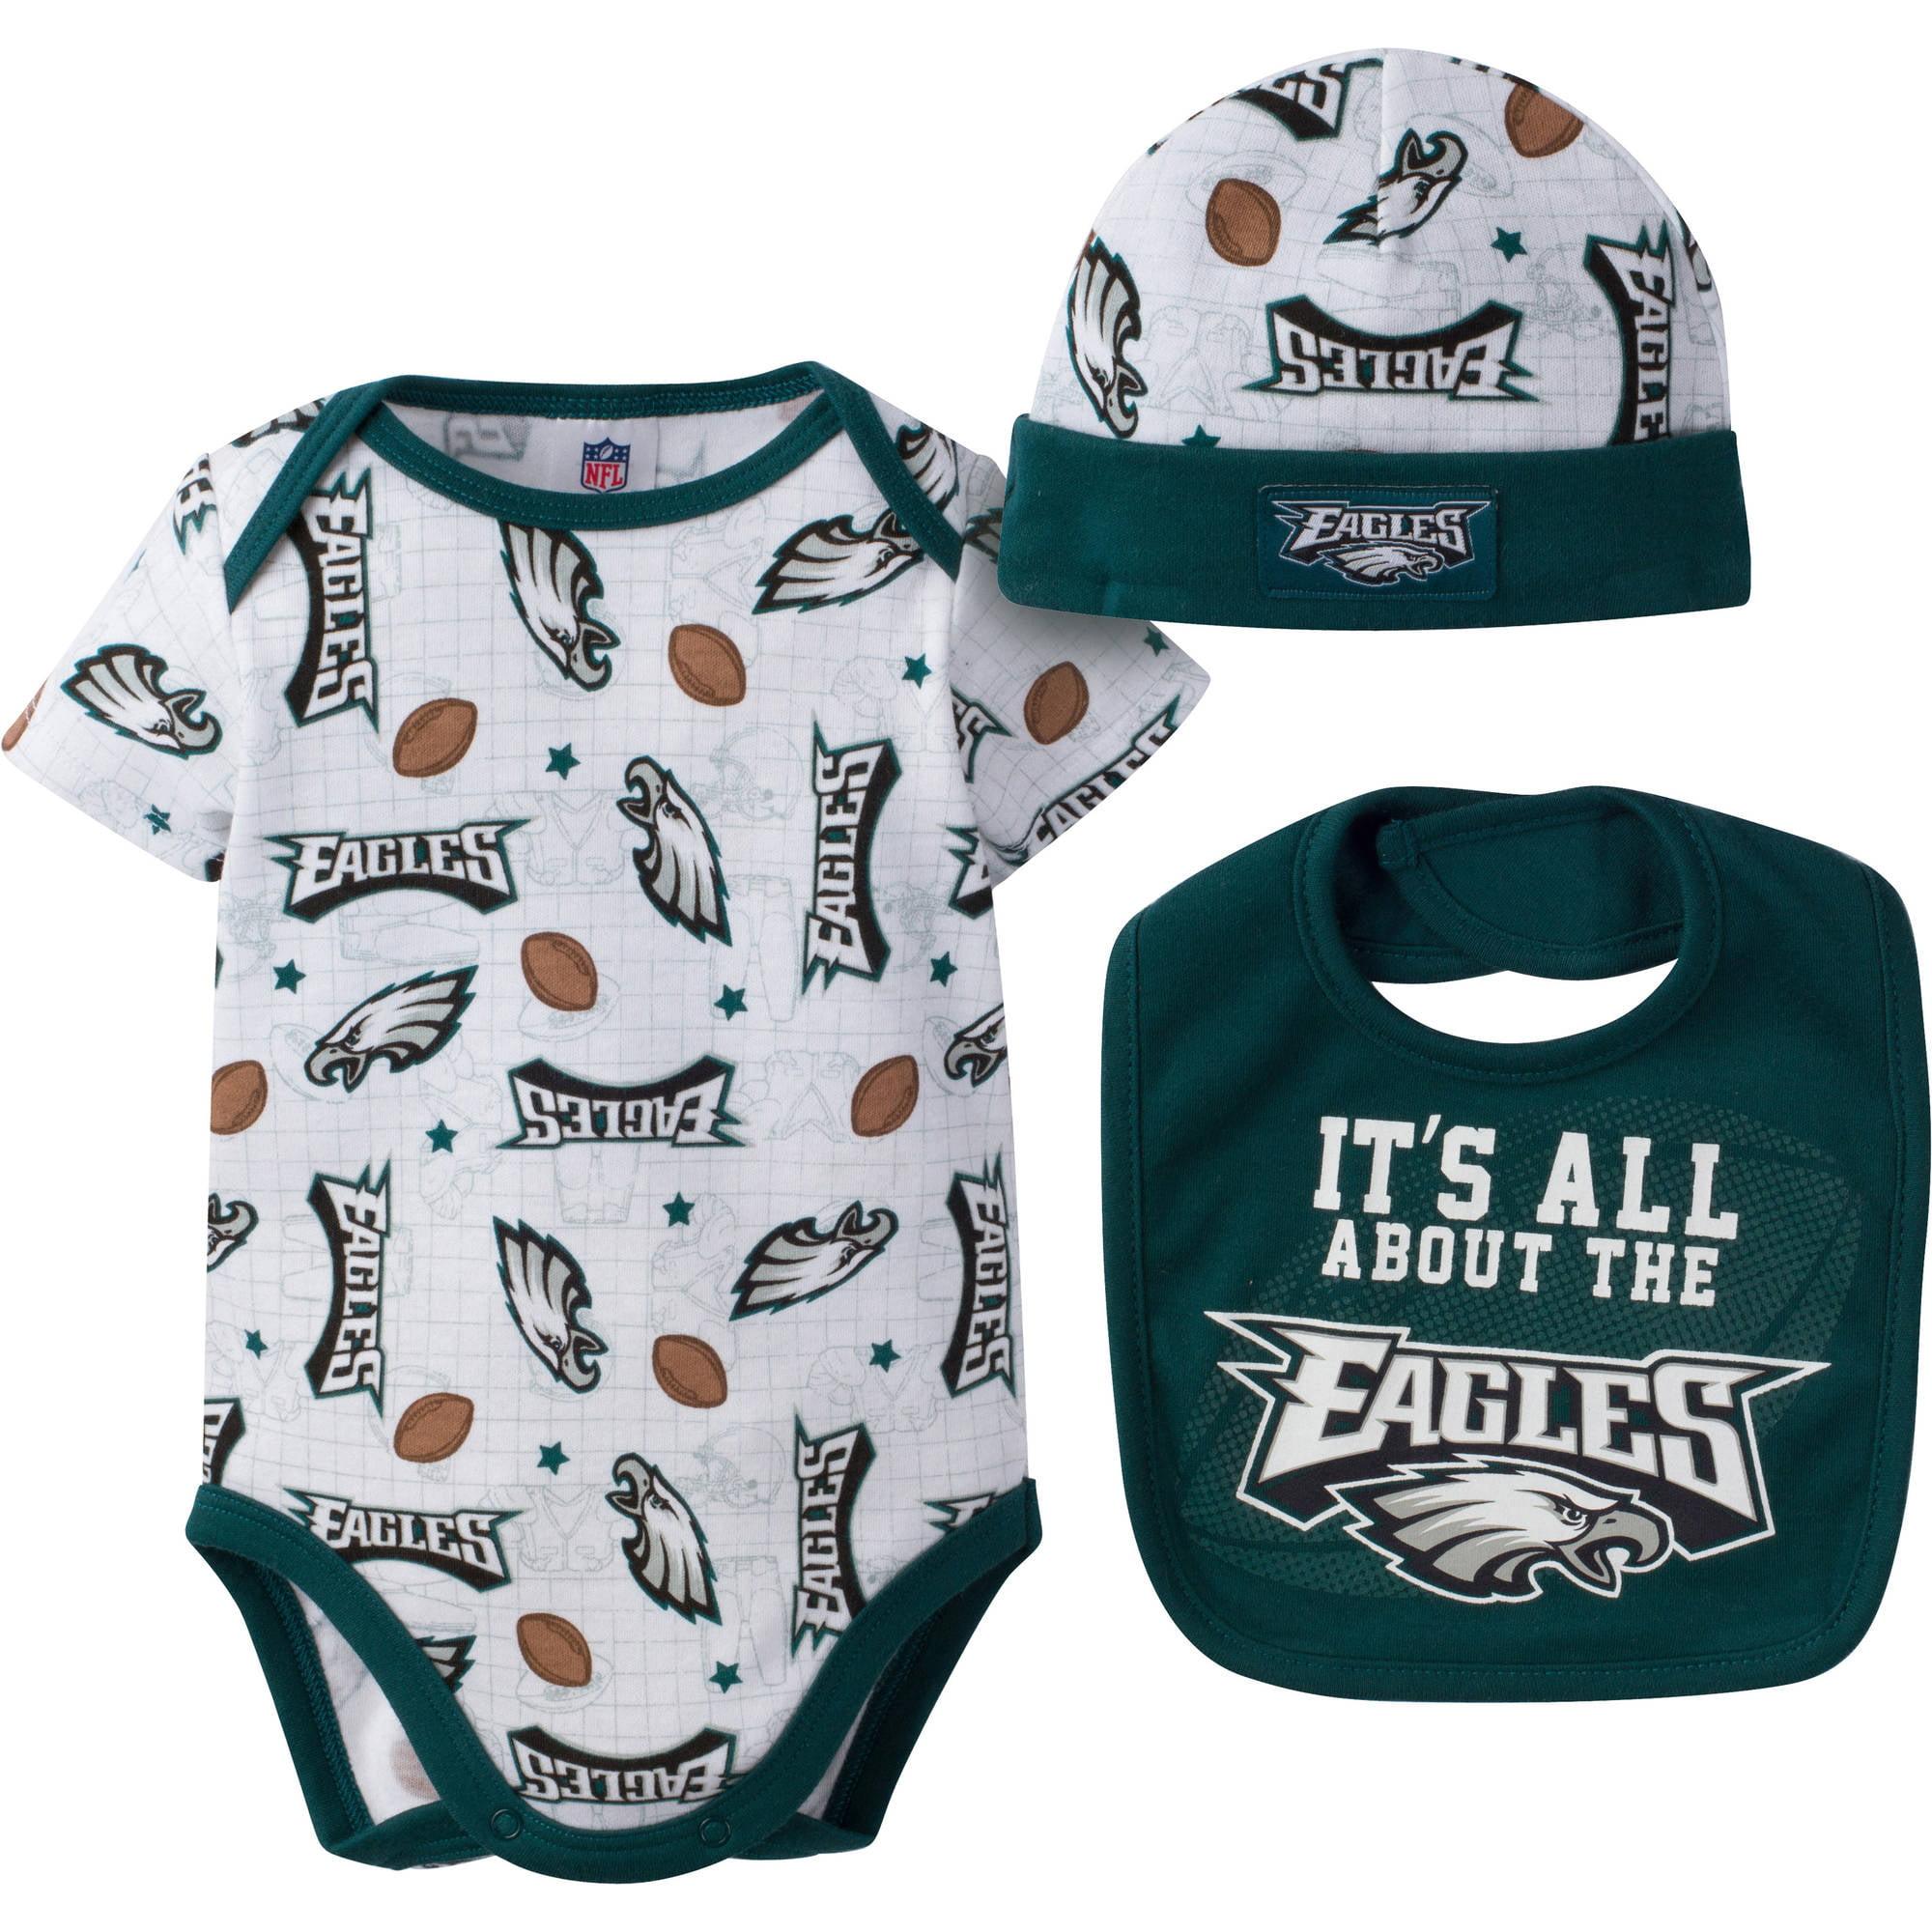 huge selection of 3e67e 8ed5b NFL Philadelphia Eagles Baby Boys Bodysuit, Bib and Cap Outfit Set, 3-Piece